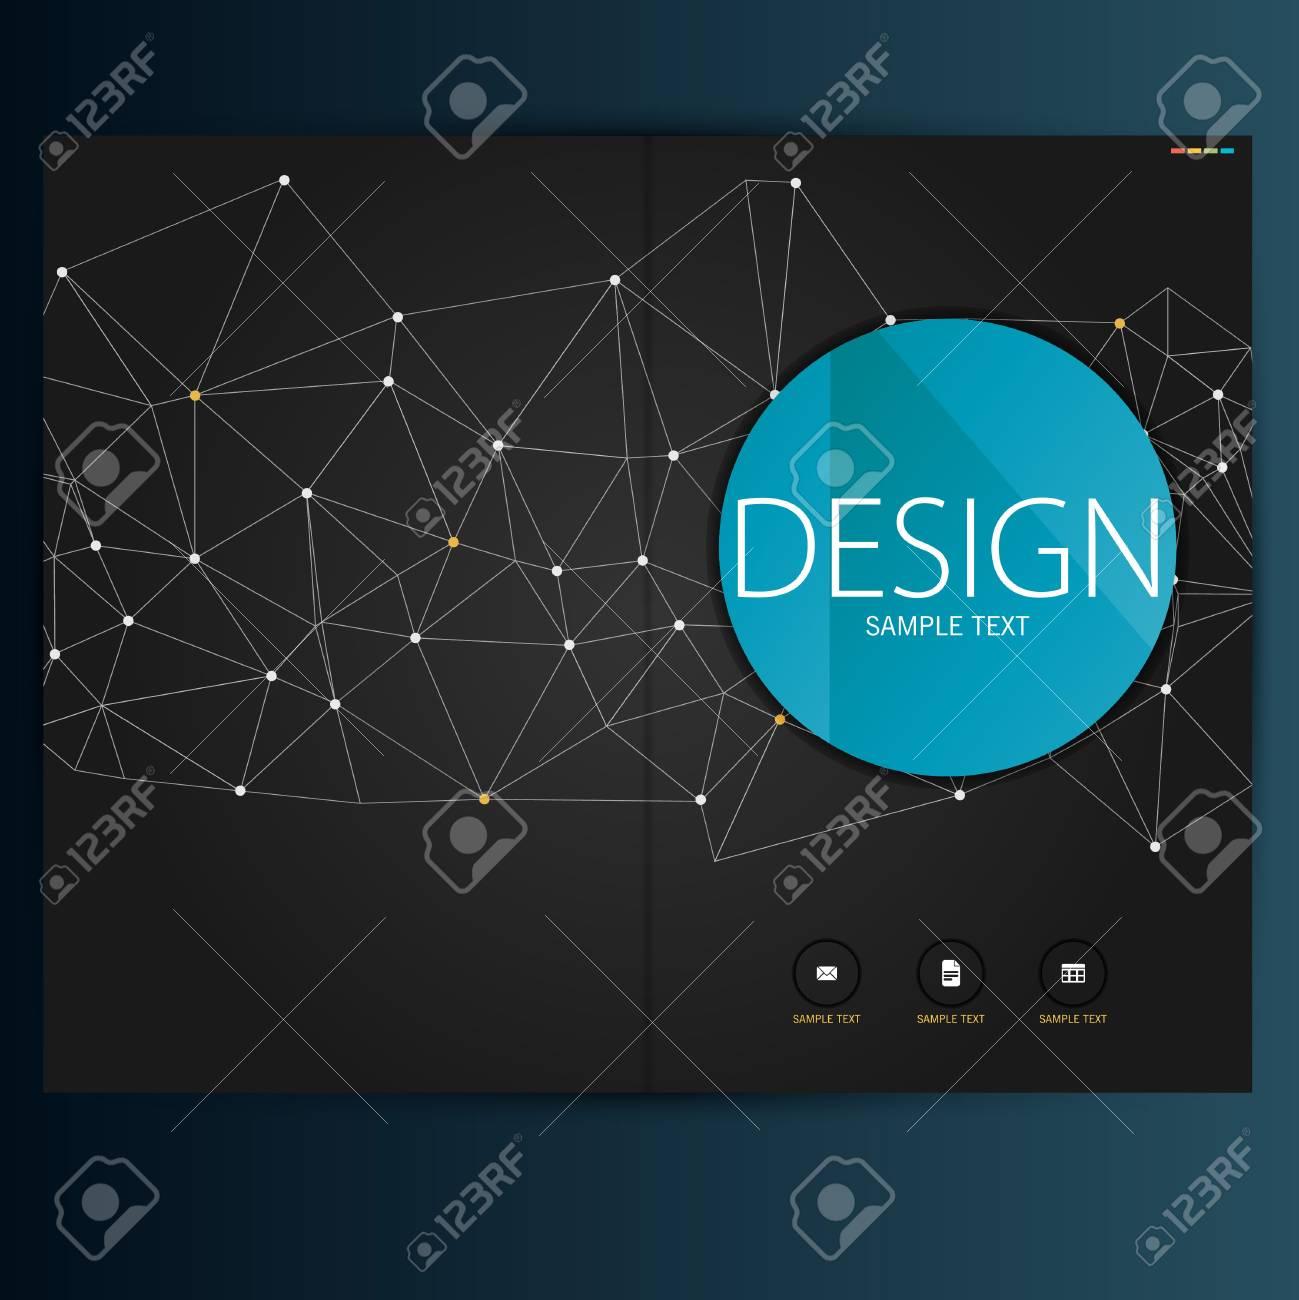 Modern Vector abstract brochure, report or flyer design template - 36949786